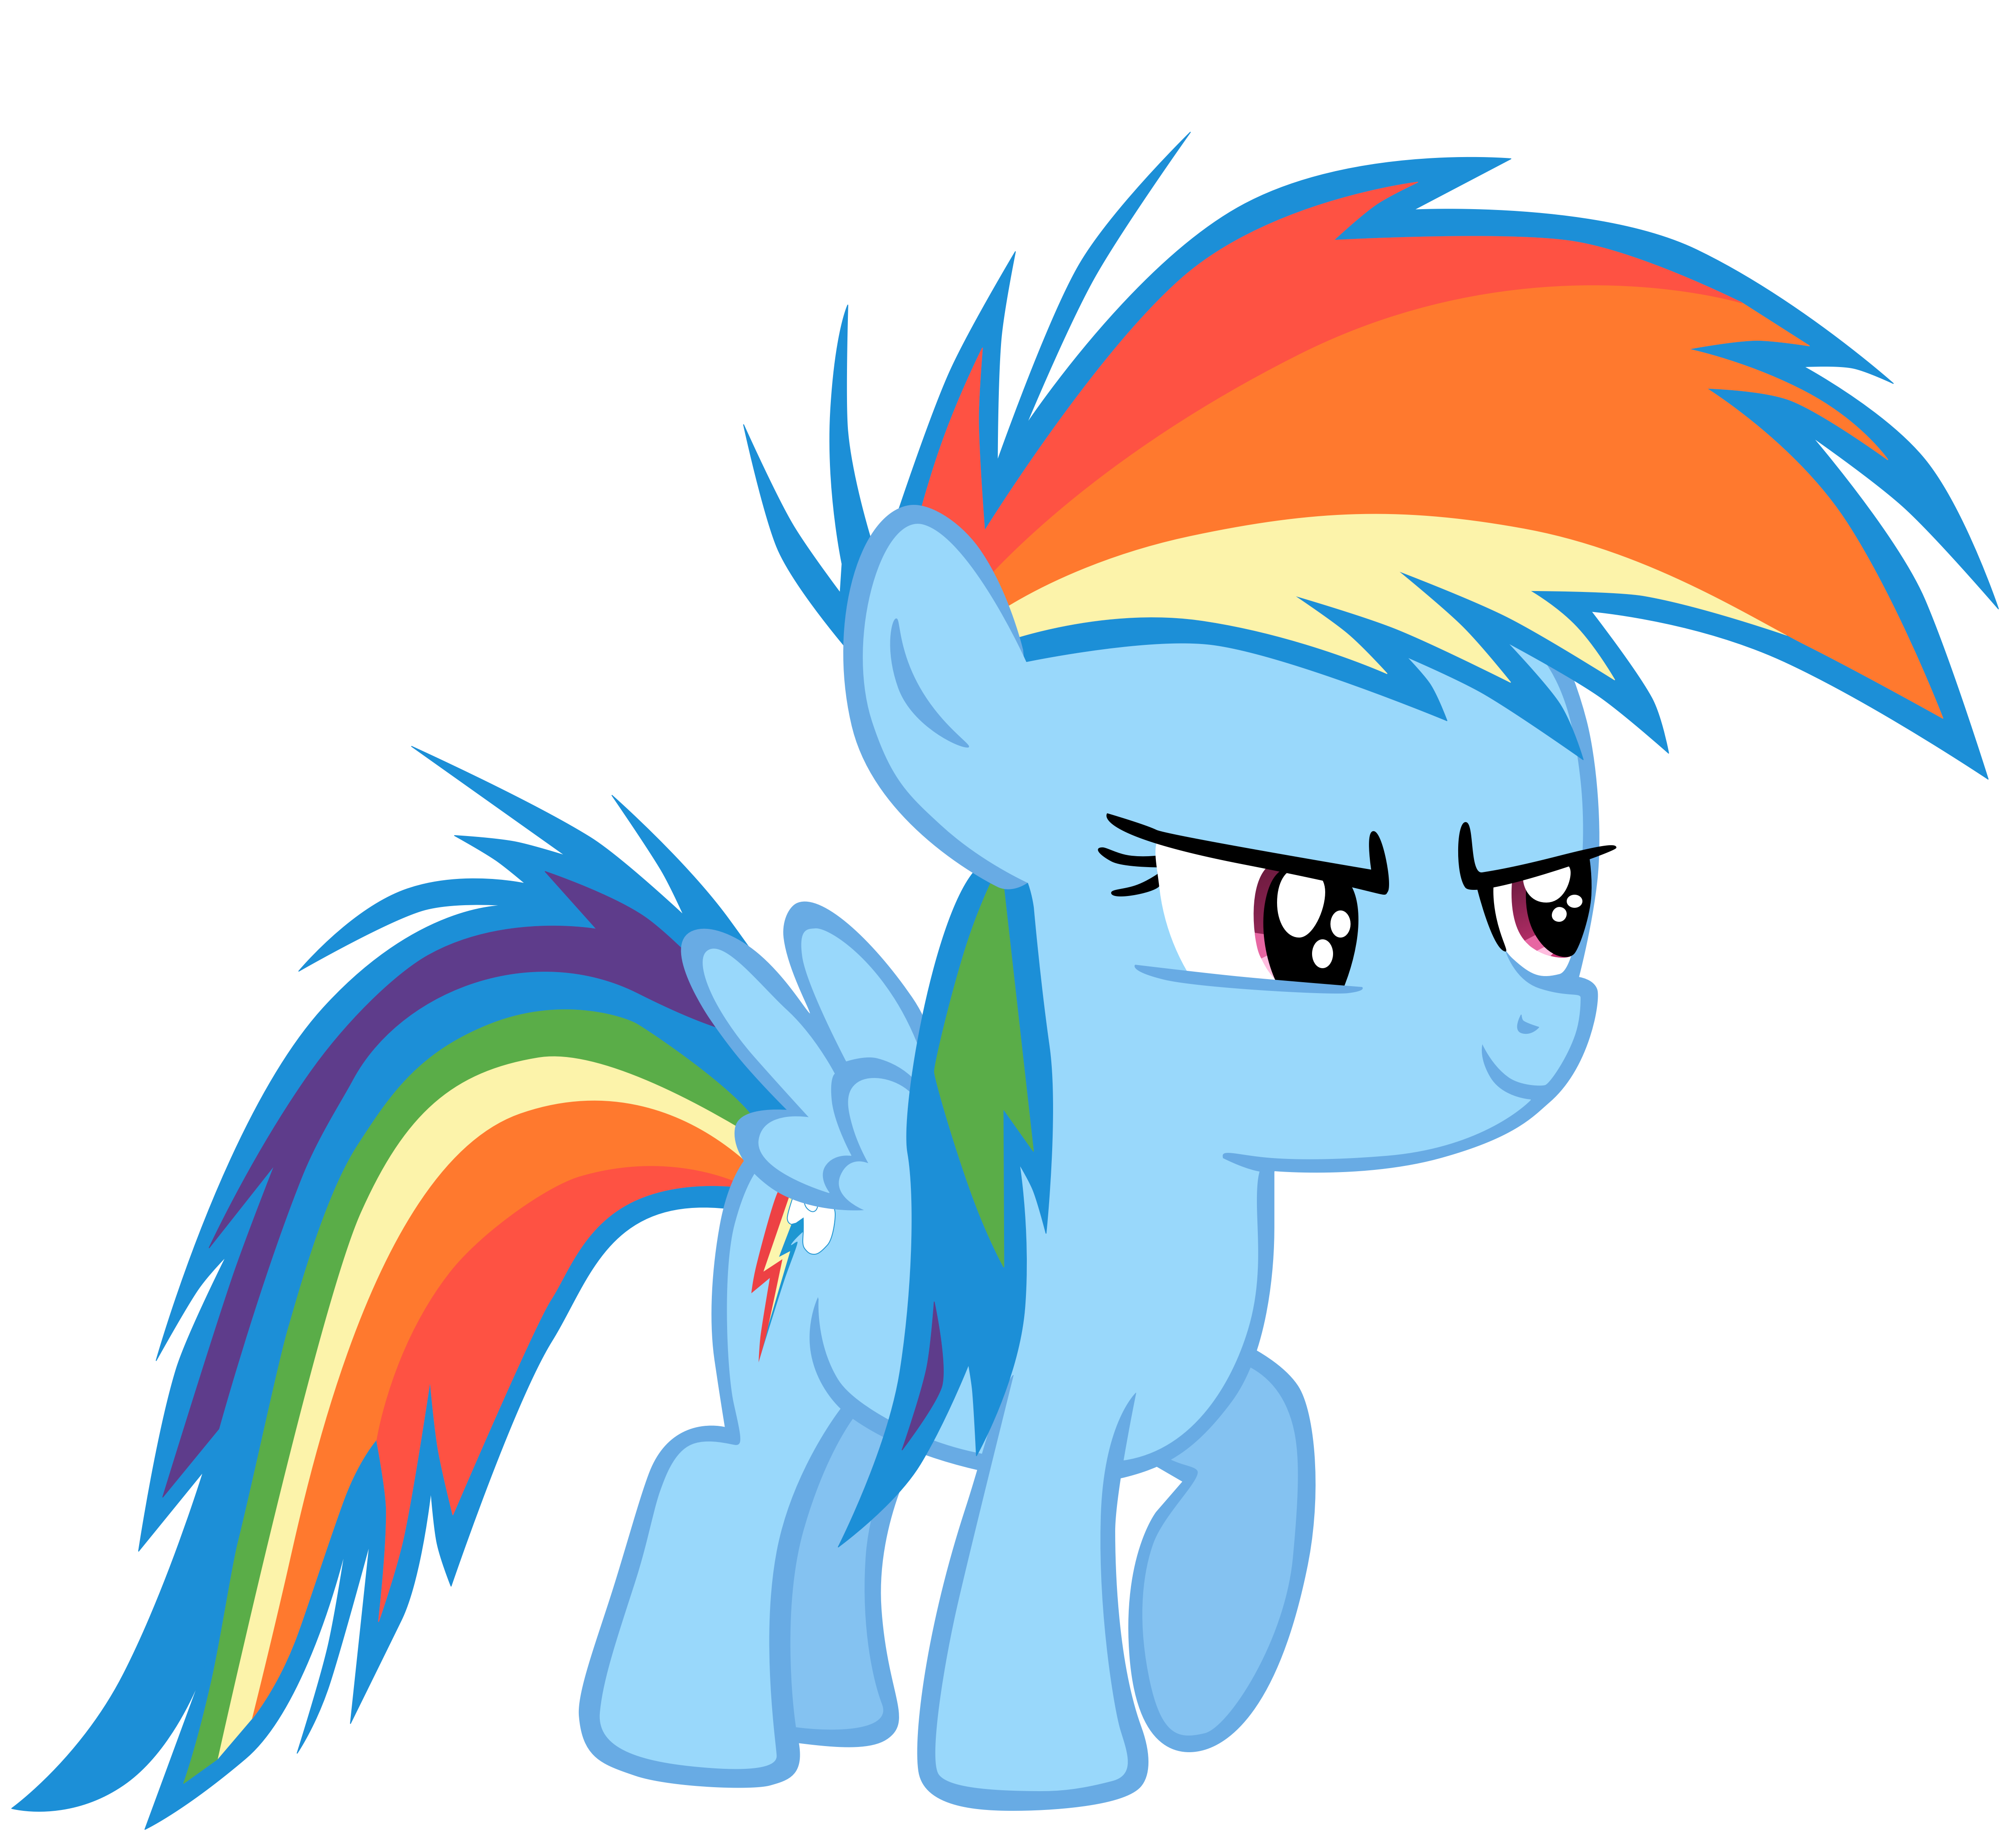 Young filly, Rainbow Dash! by Flutterflyraptor on DeviantArt